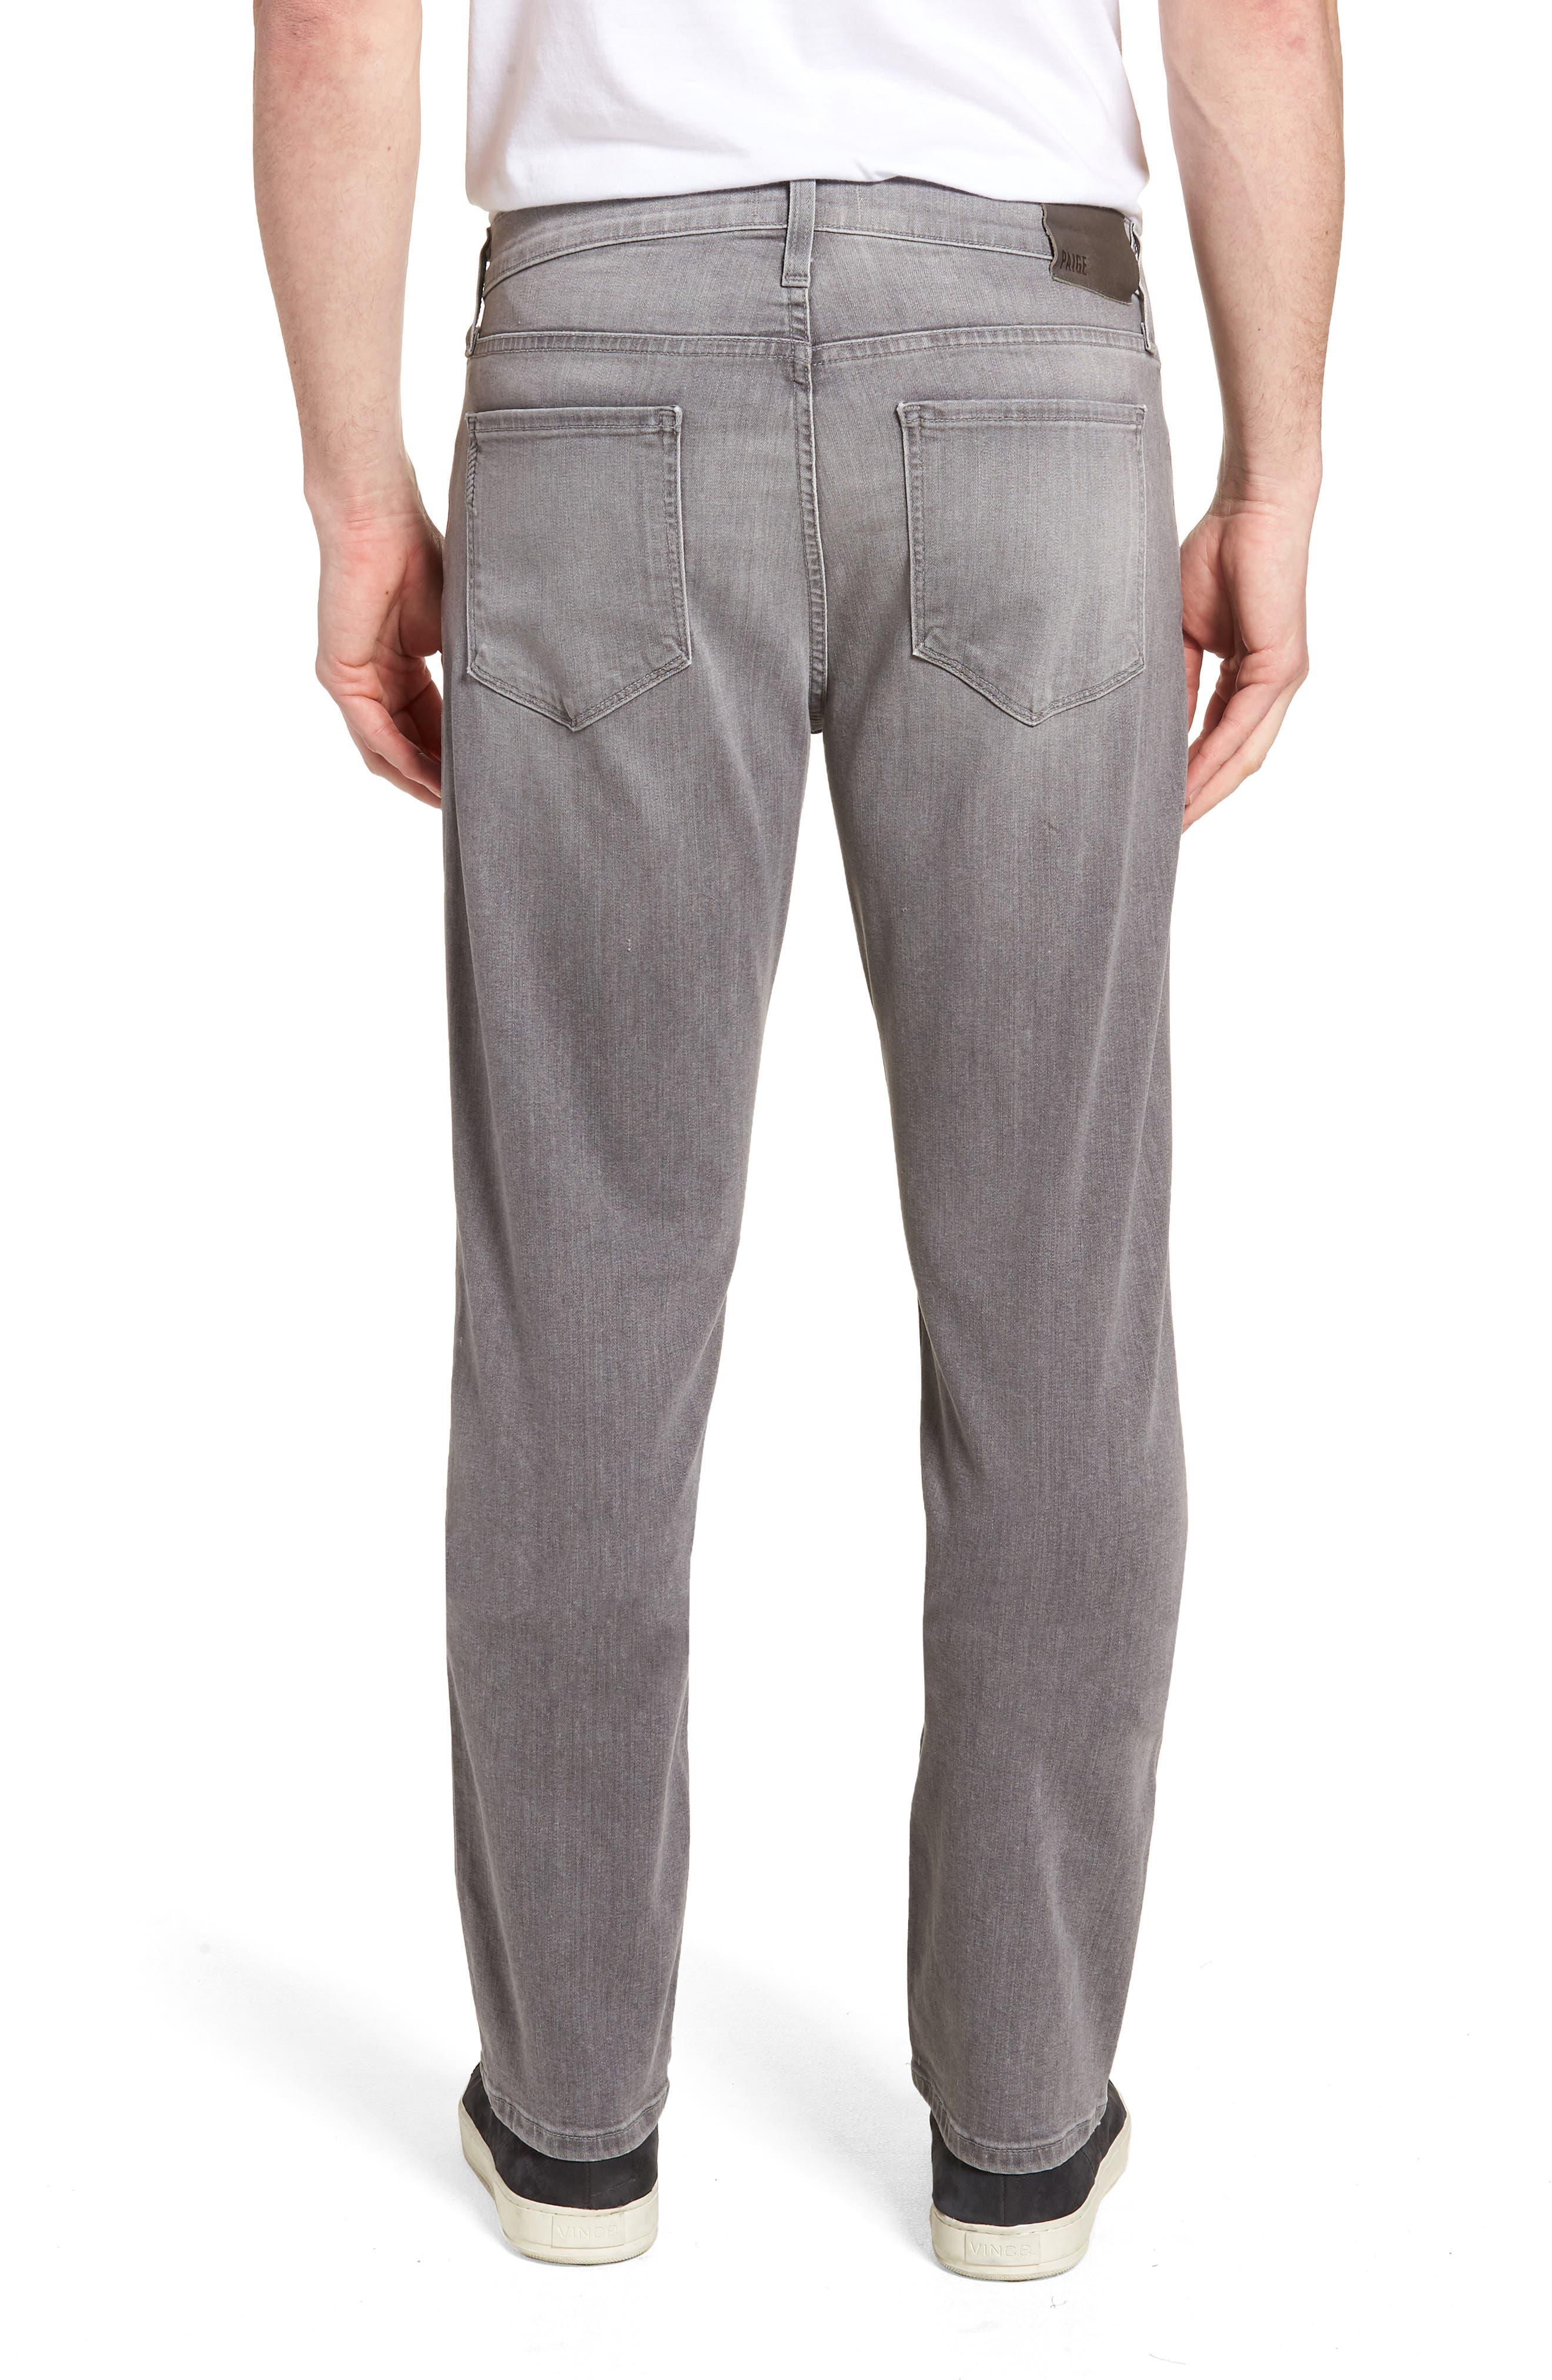 Normandie Straight Leg Jeans,                             Alternate thumbnail 2, color,                             030